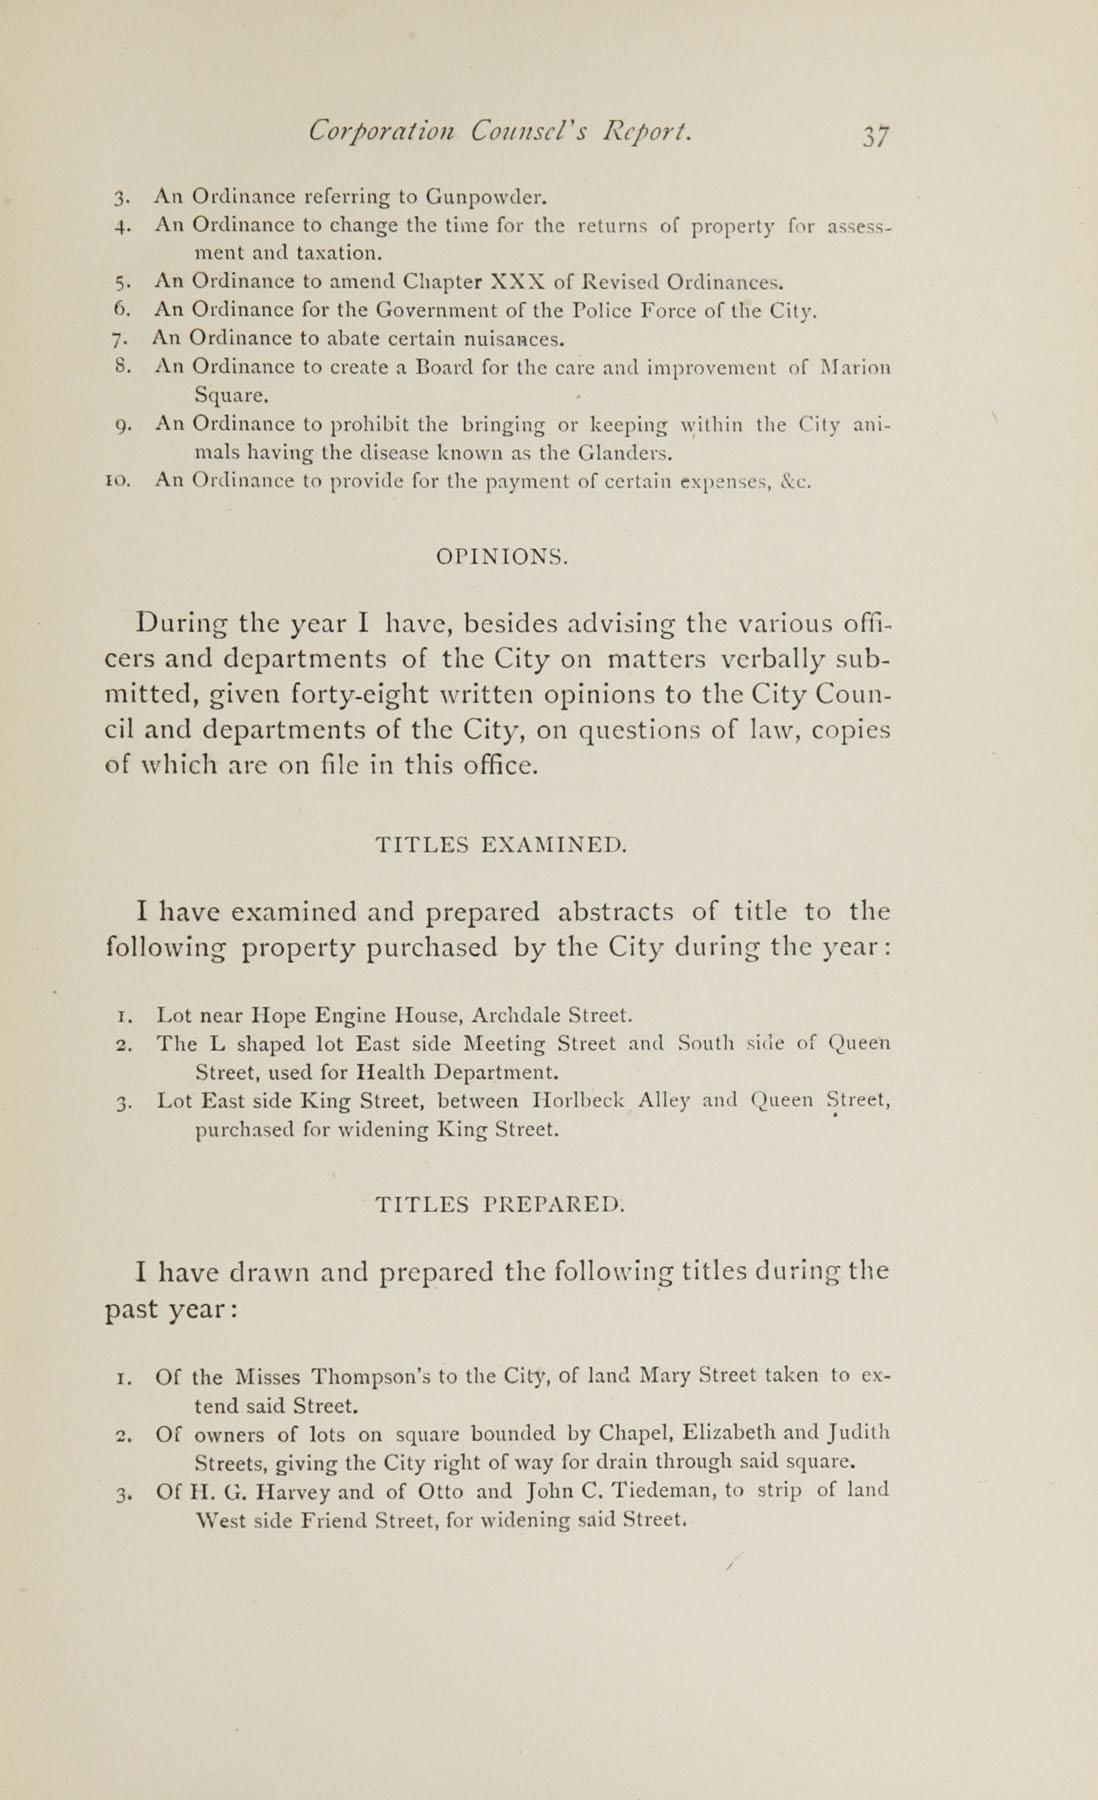 Charleston Yearbook, 1882, page 37